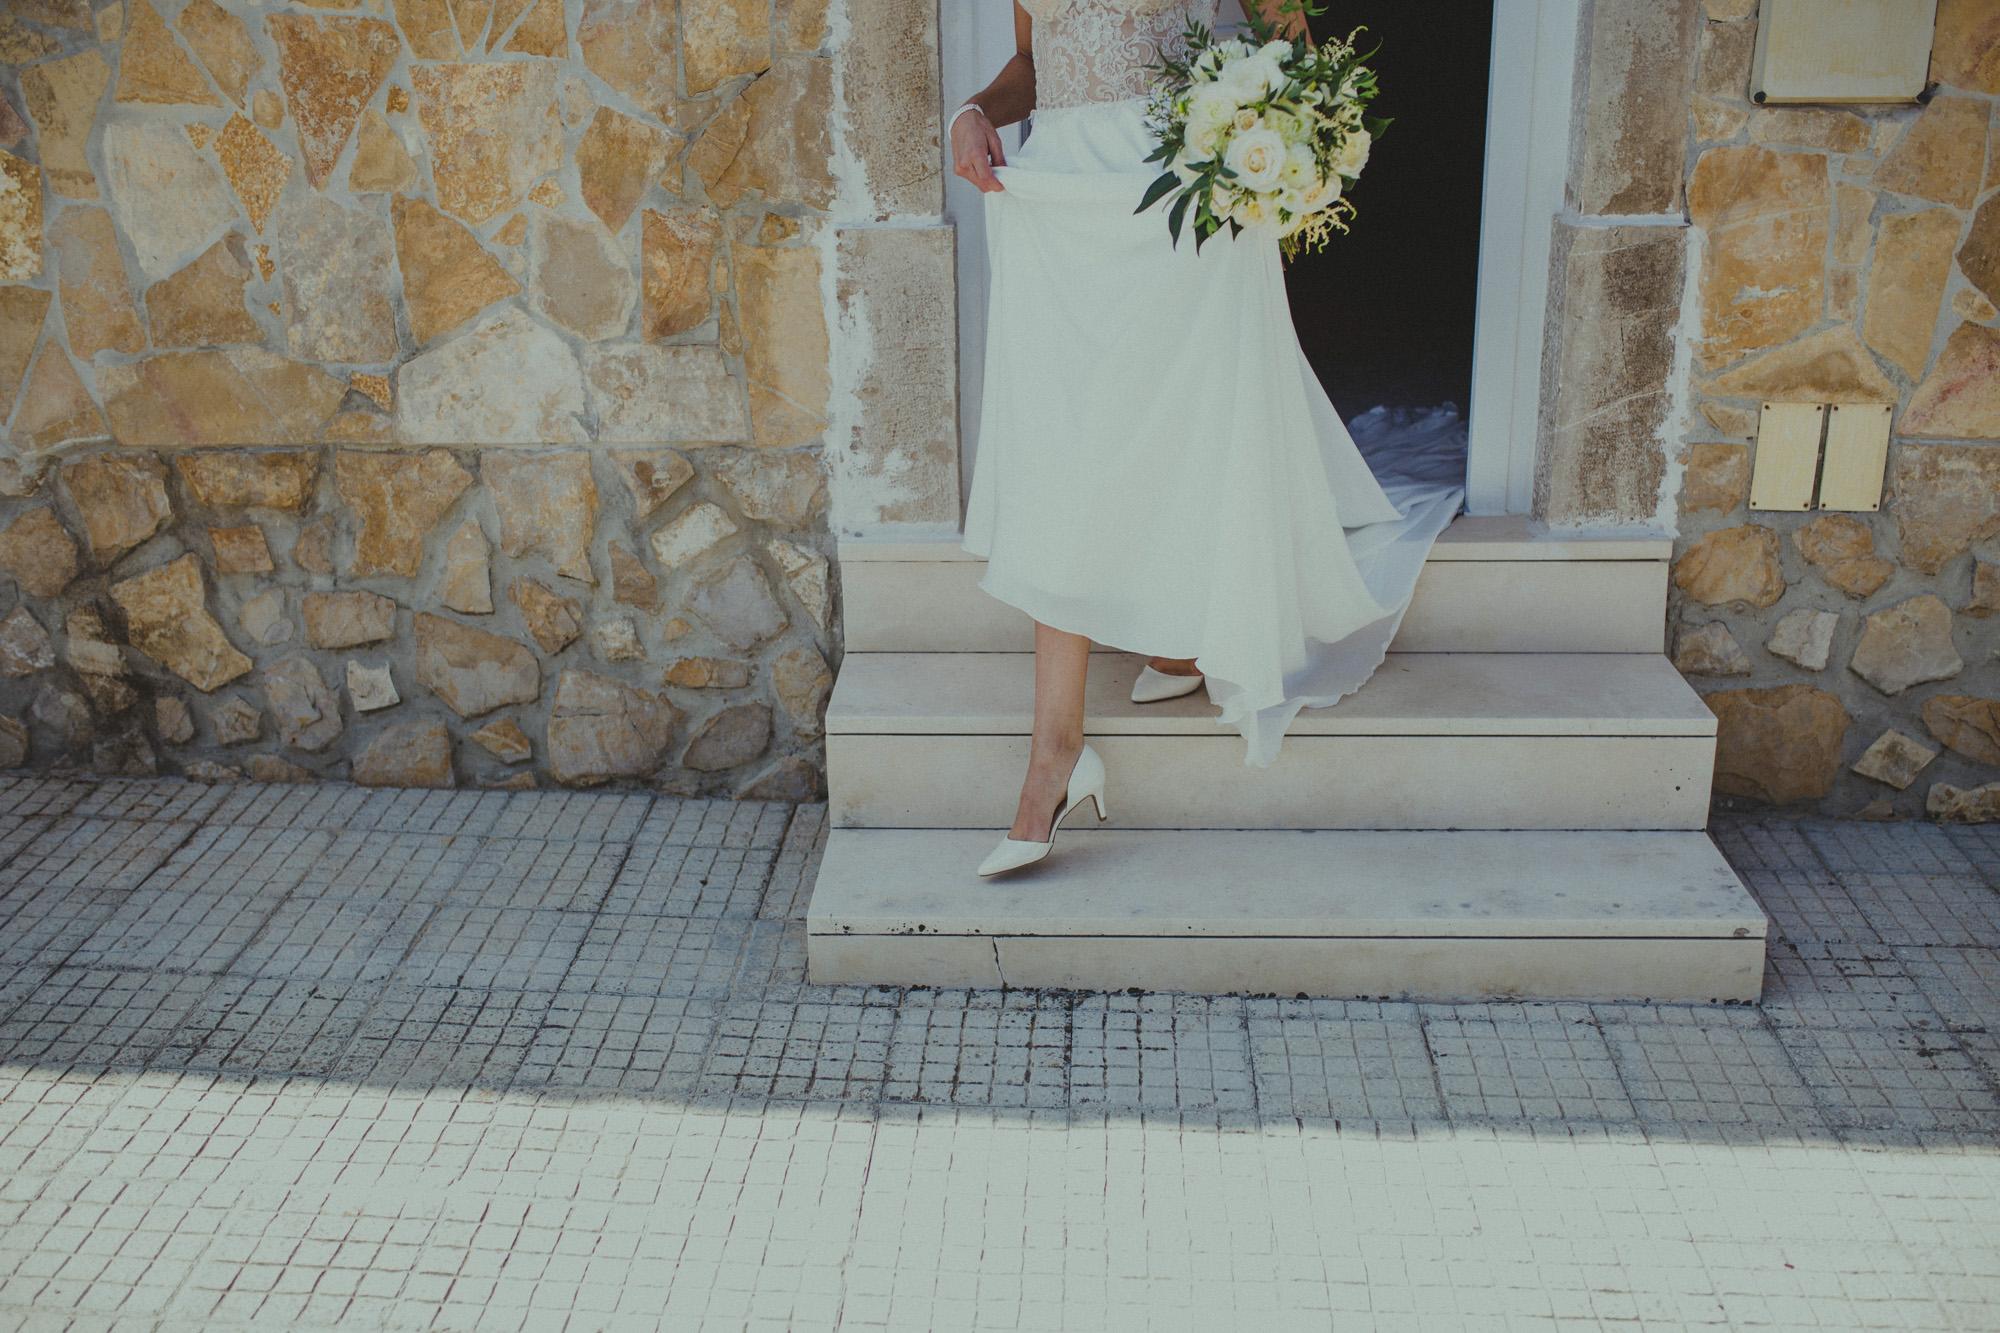 070-carina-e-samuel-wedding-casamento-quinta-dos-rouxinois-rustico-my-fancy-wedding-mafra-malveira-lisboa-sintra-cascais-filipe-santiago-fotografia-fotografo-lifestyle-destination-portugal